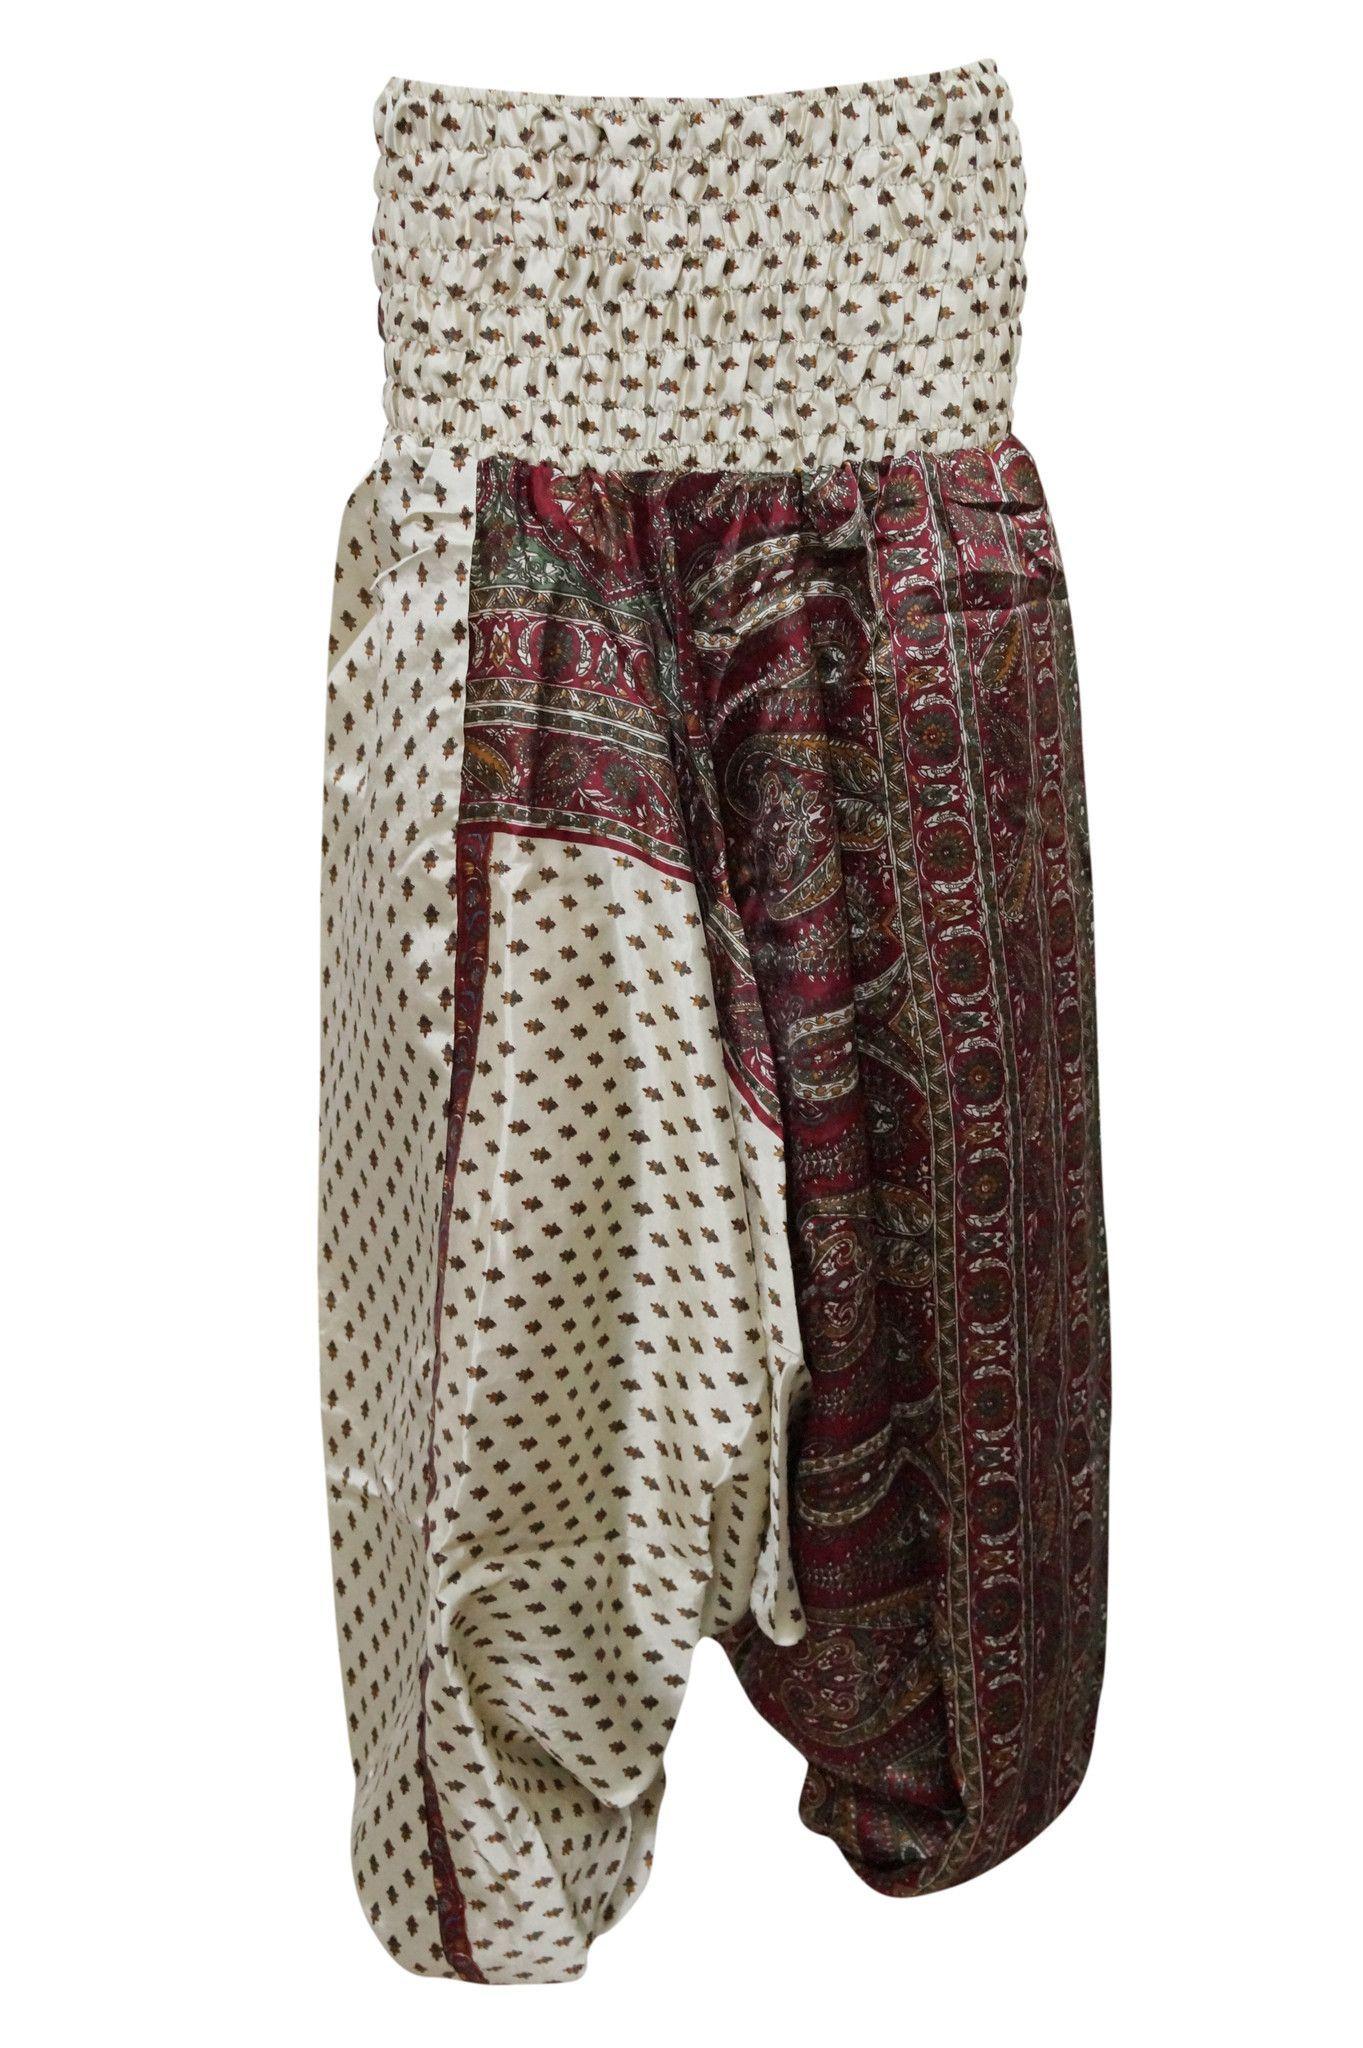 d1273d5e08c Womens Harem Pants Maroon Beige Hippy Boho Gypsy Yoga Jumpsuit Apparel